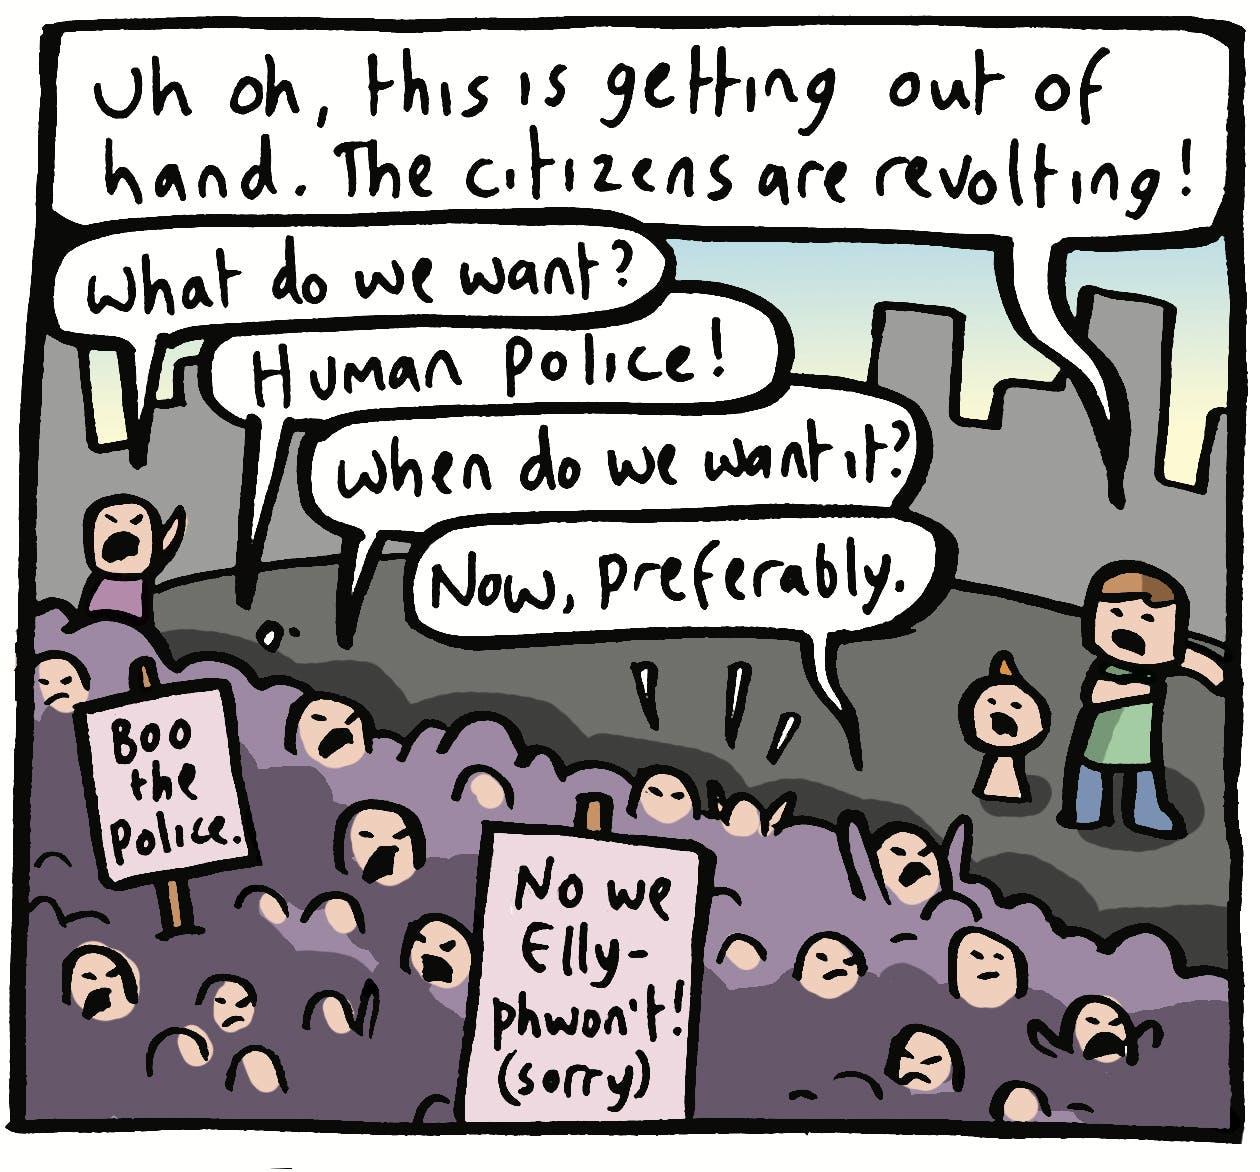 The citizens are revolting!